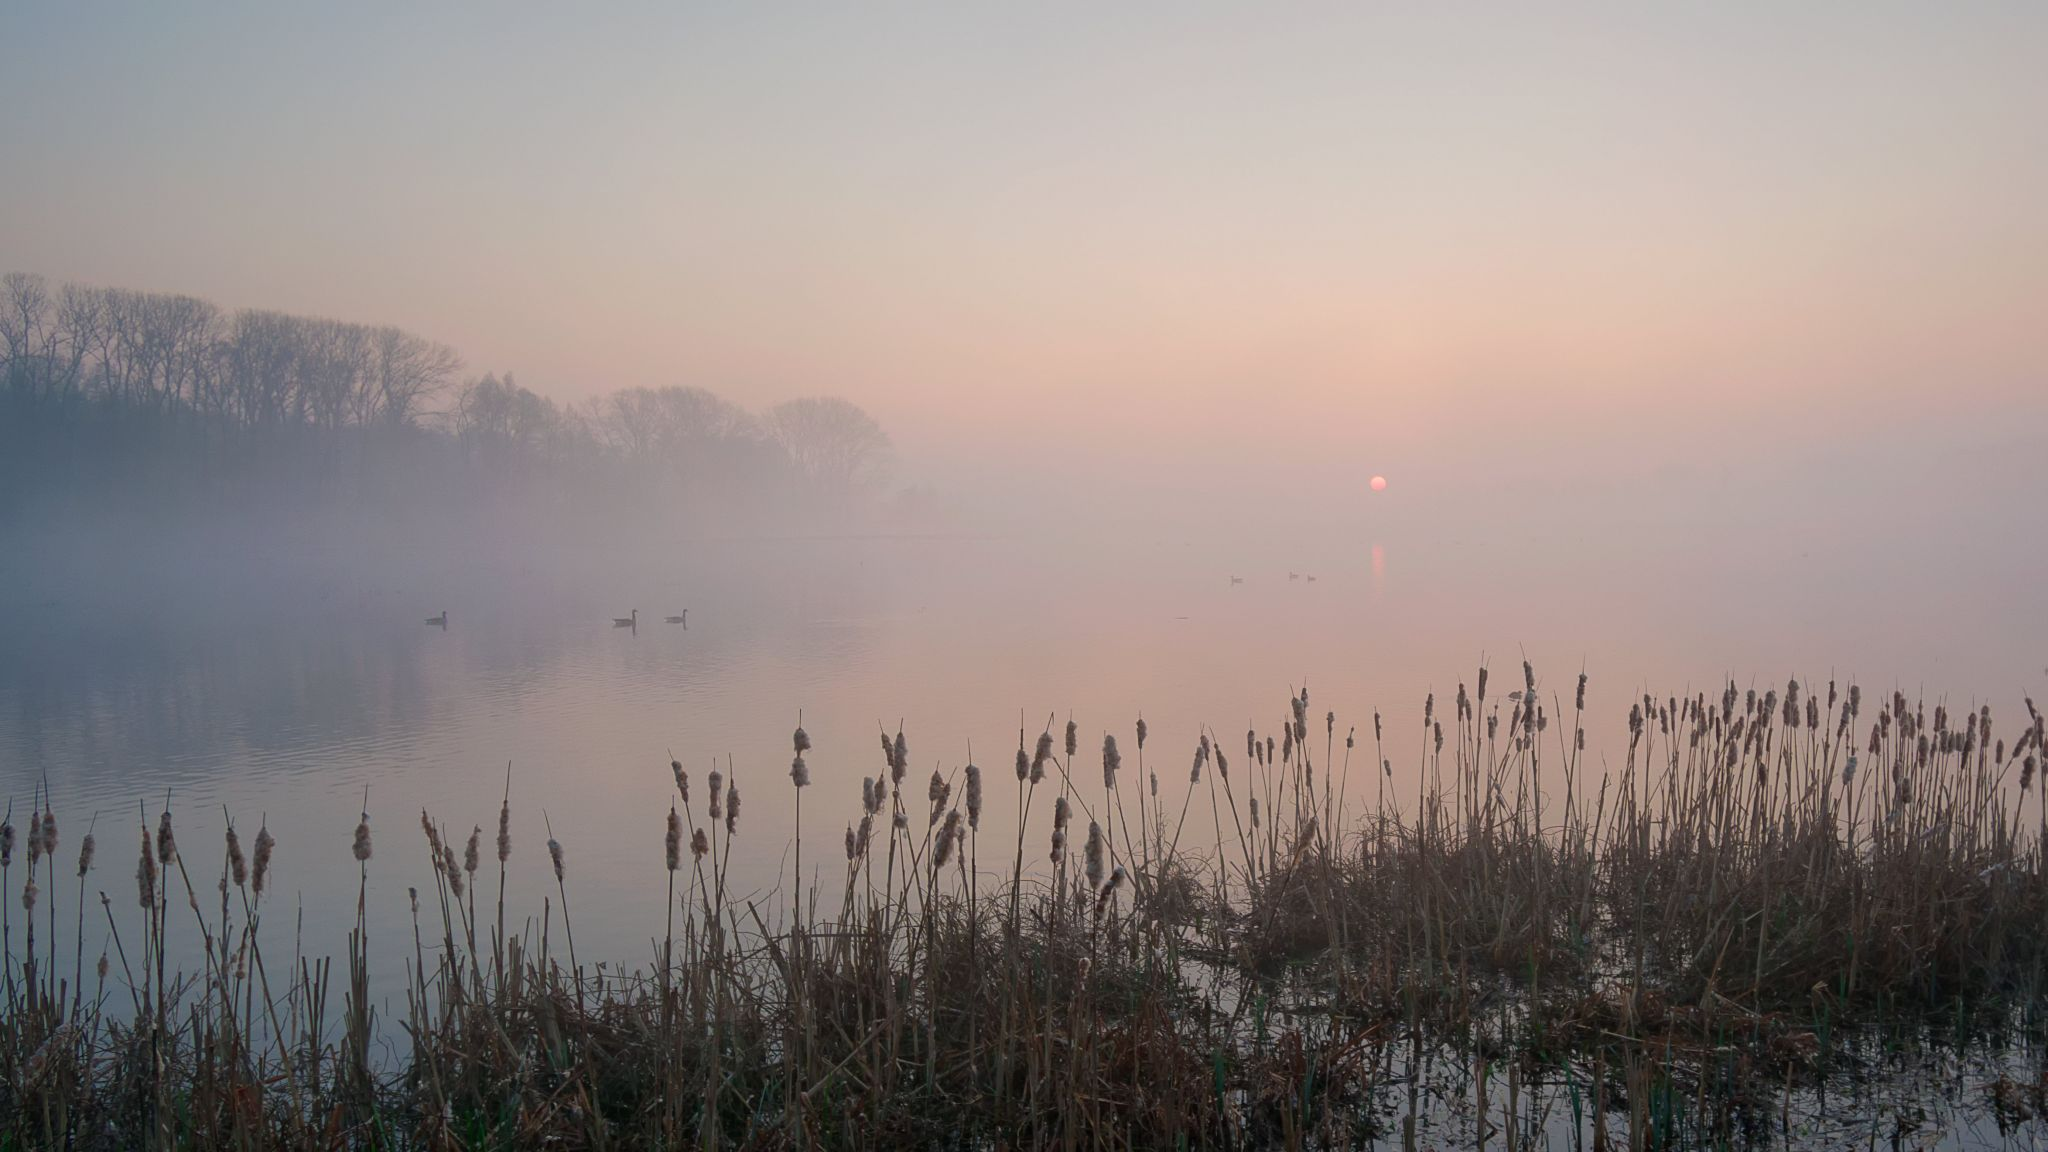 Misty sunrise in nature reserve Bourgoyen, Belgium., Belgium